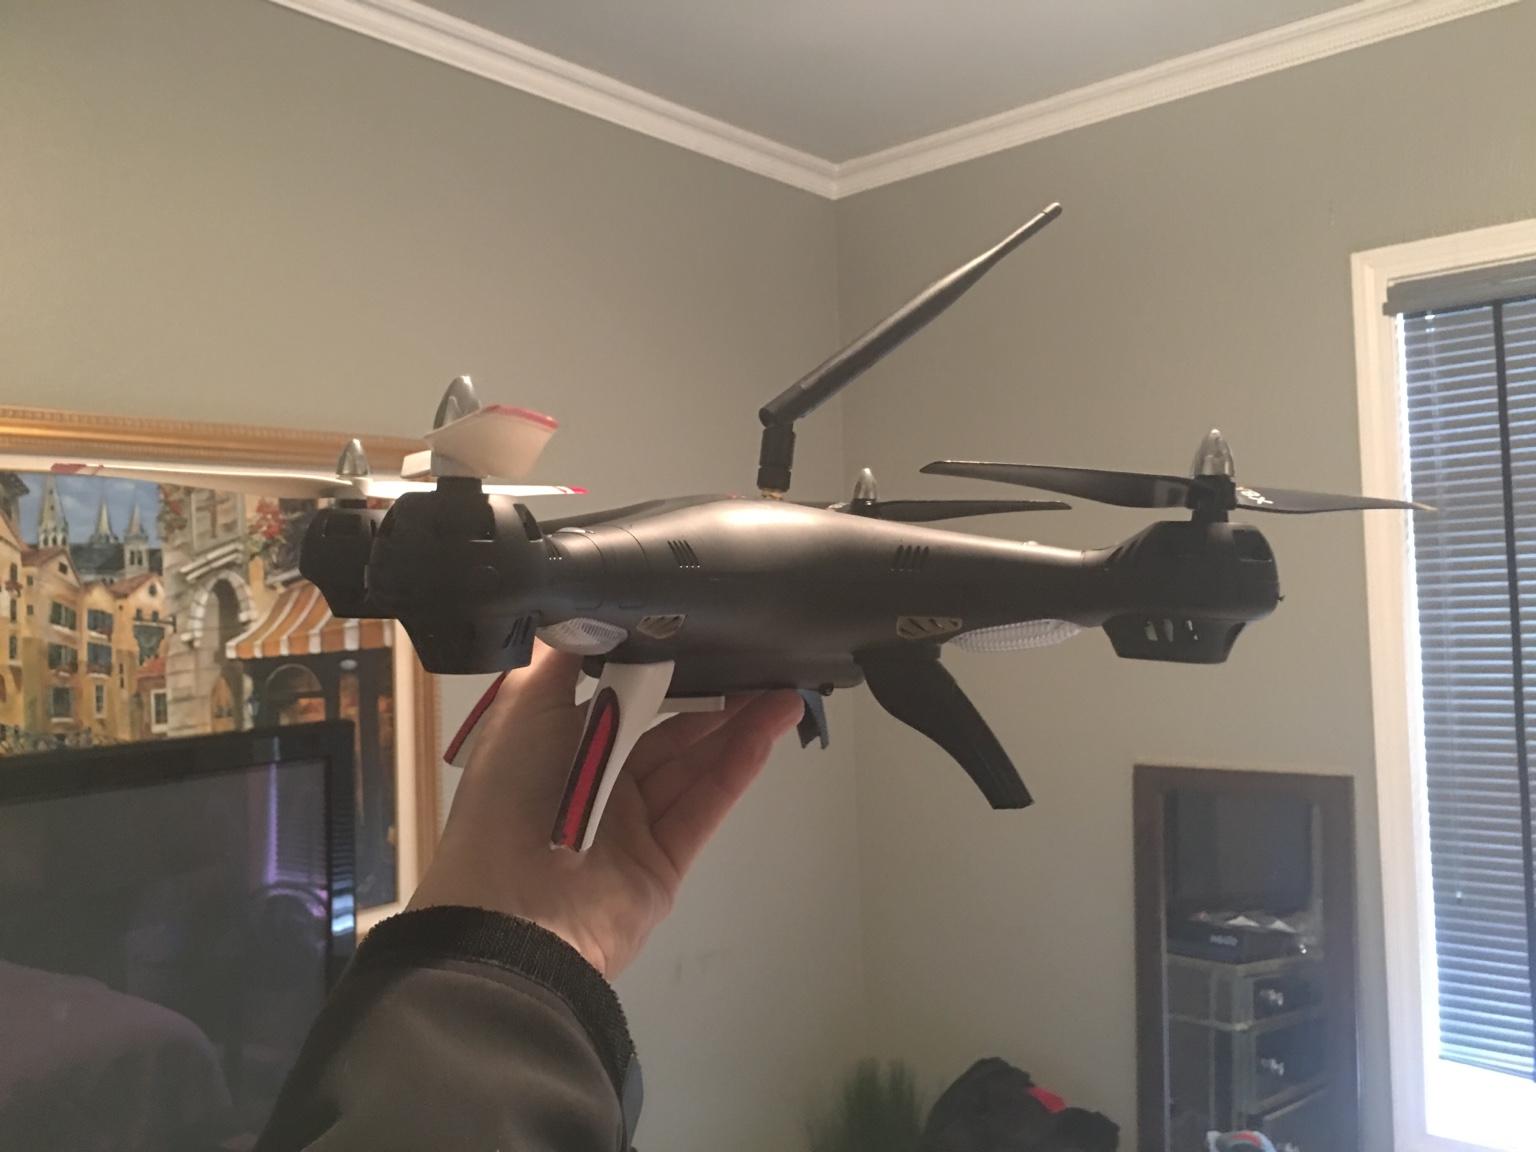 Best cheap practice drone? | DJI Mavic Drone Forum